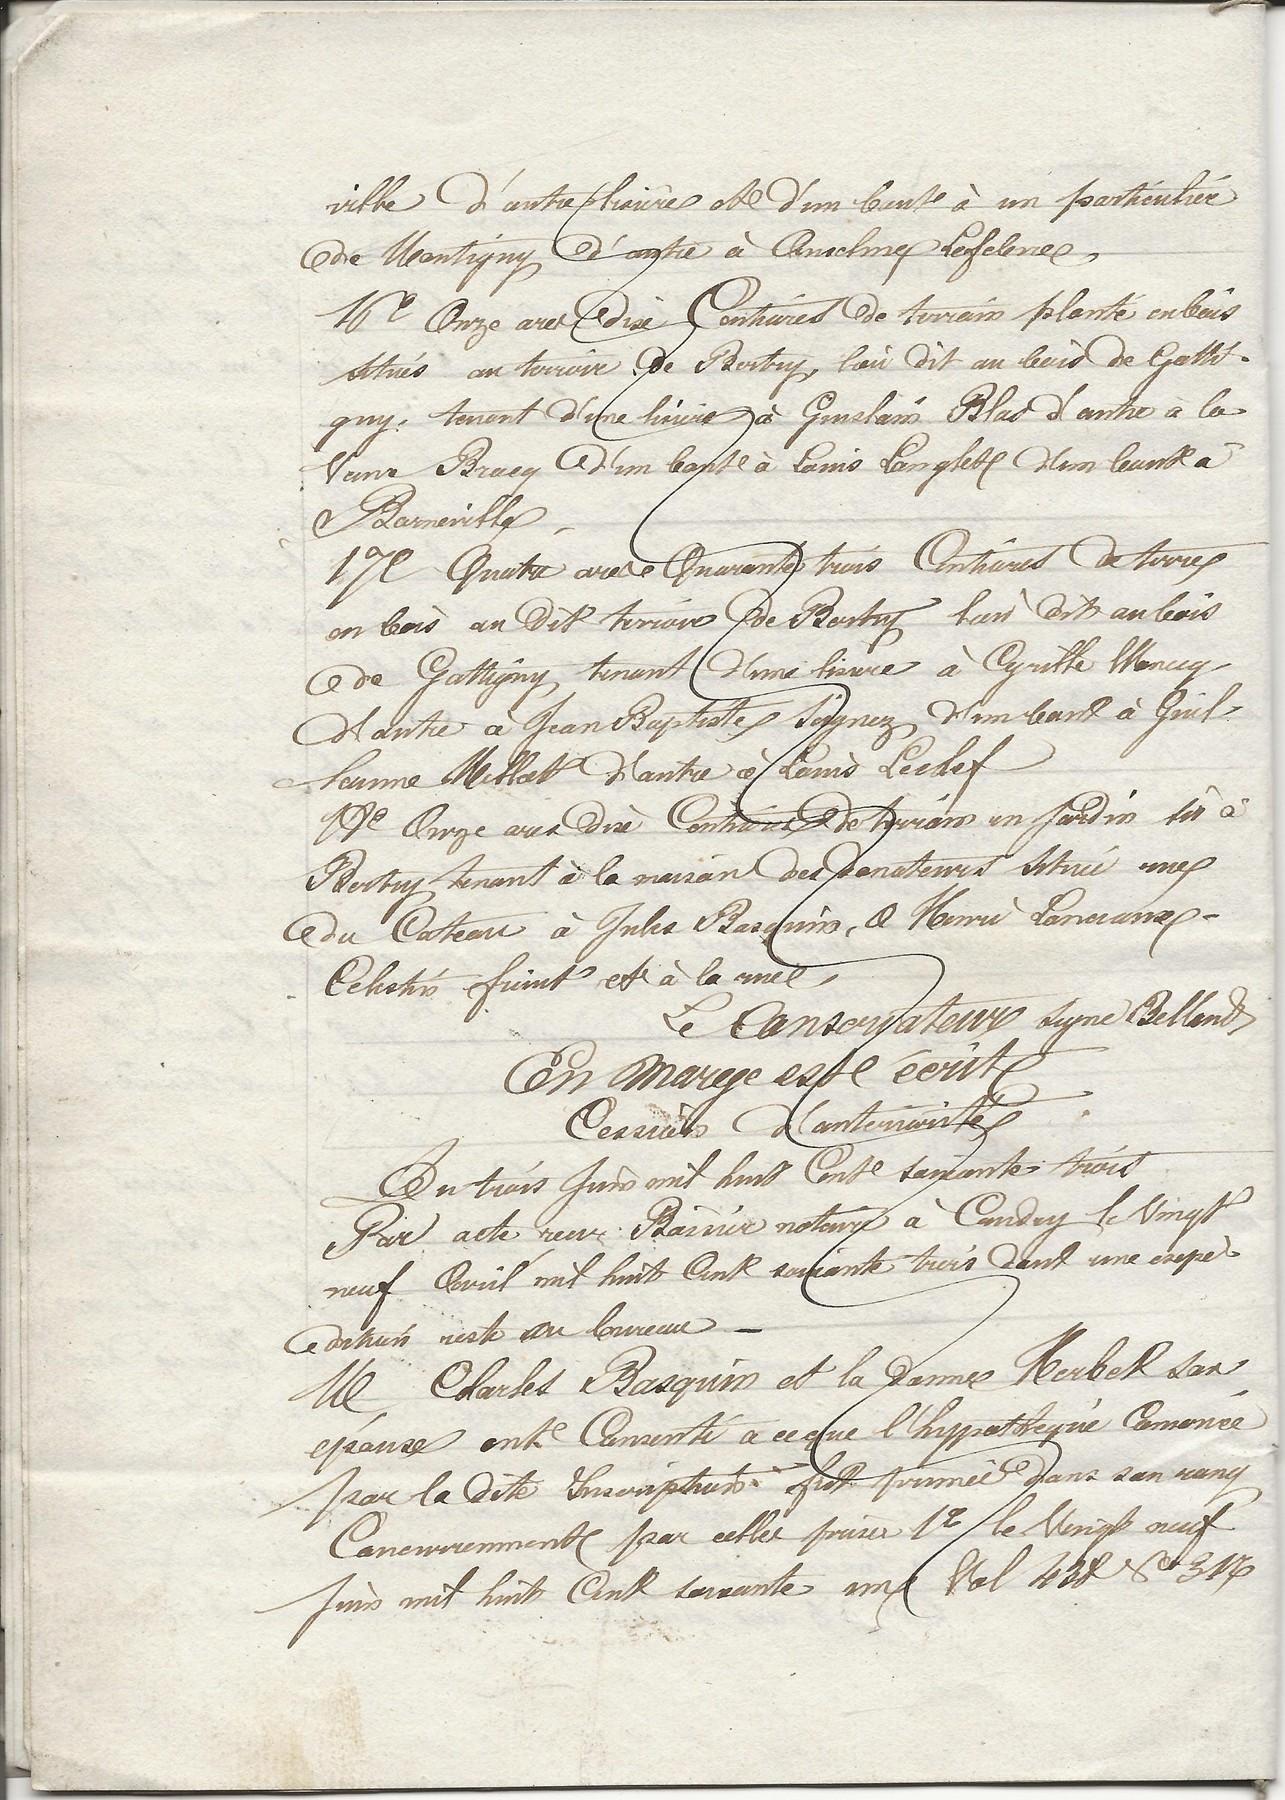 1863 document hypothecaire basquin 001 4